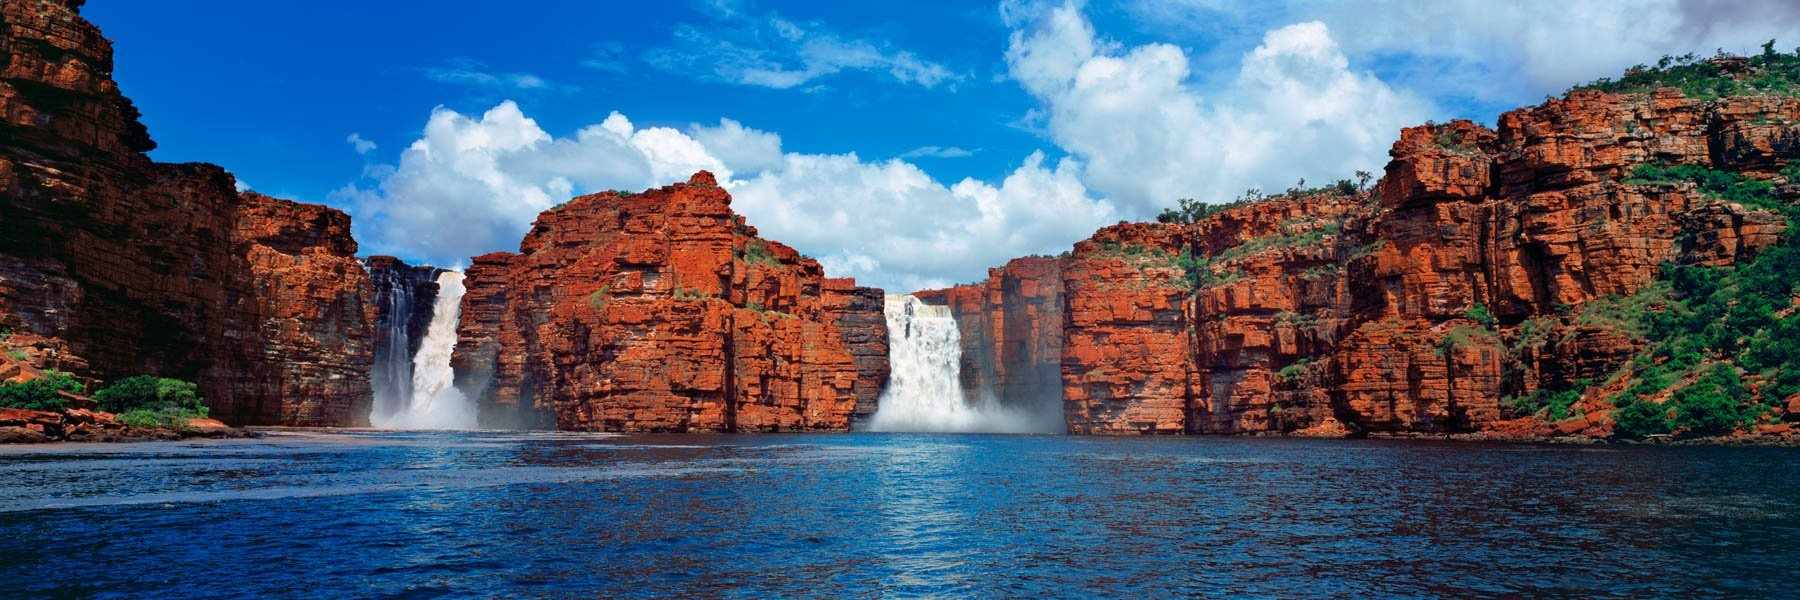 The twin cataracts of King George Falls, Kimberleys, WA, Australia.